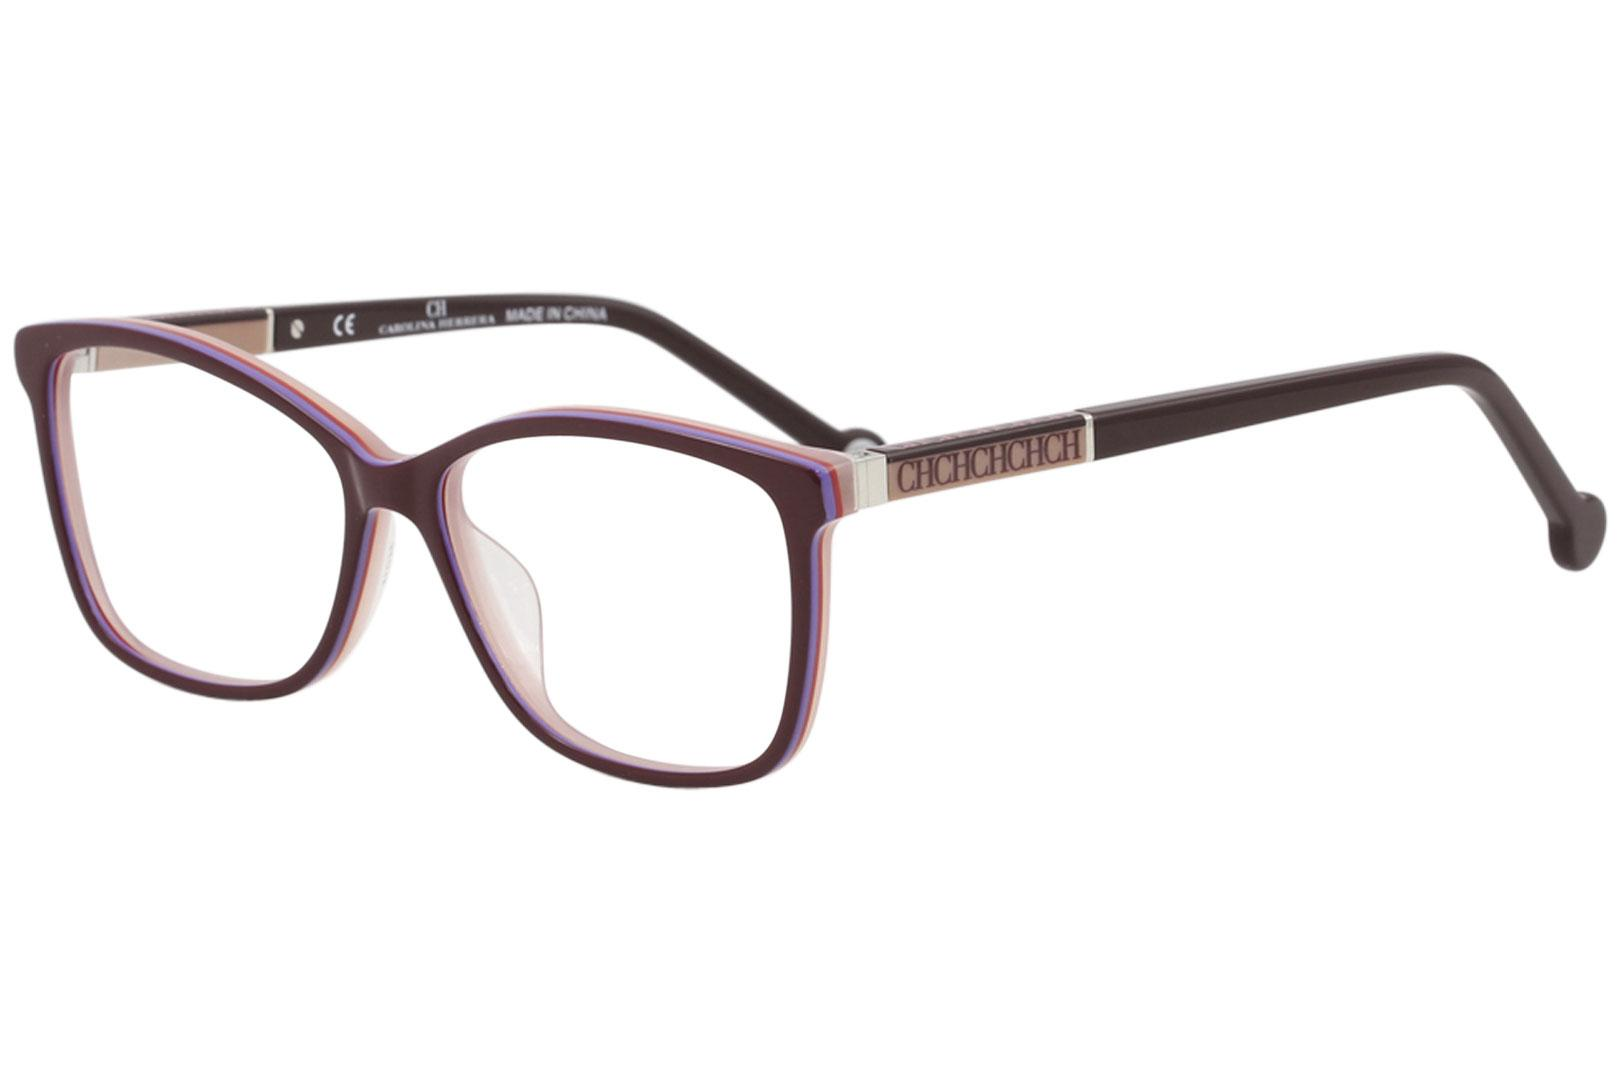 CH Carolina Herrera Eyeglasses VHE672K 672K 0M56 Burgundy Optical Frame 54mm